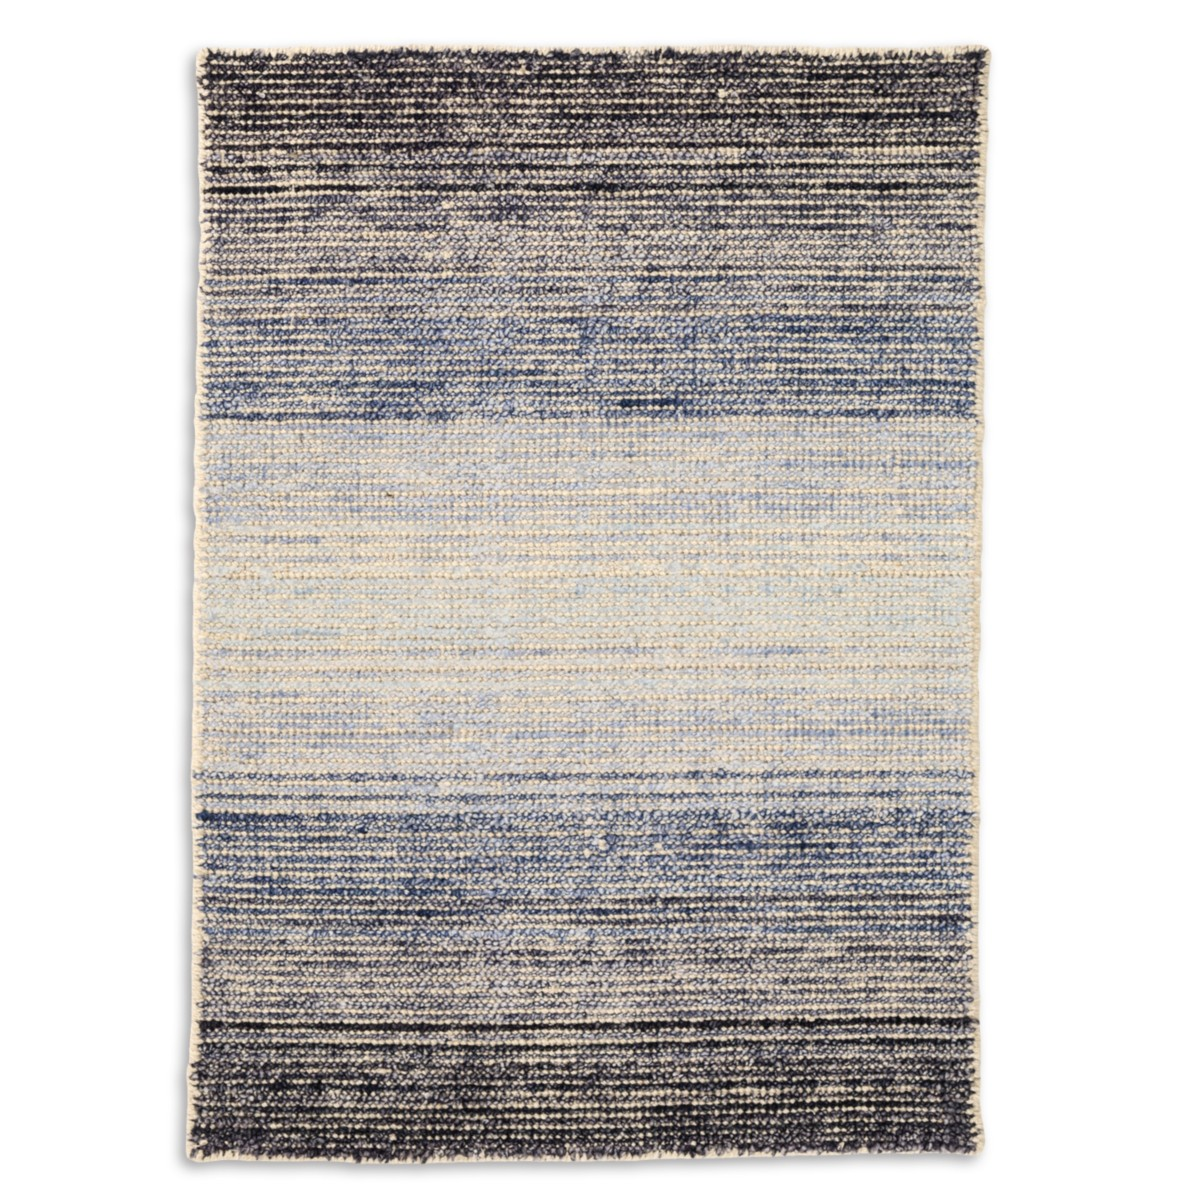 Moon Cotton Viscose Woven Rug - Blue